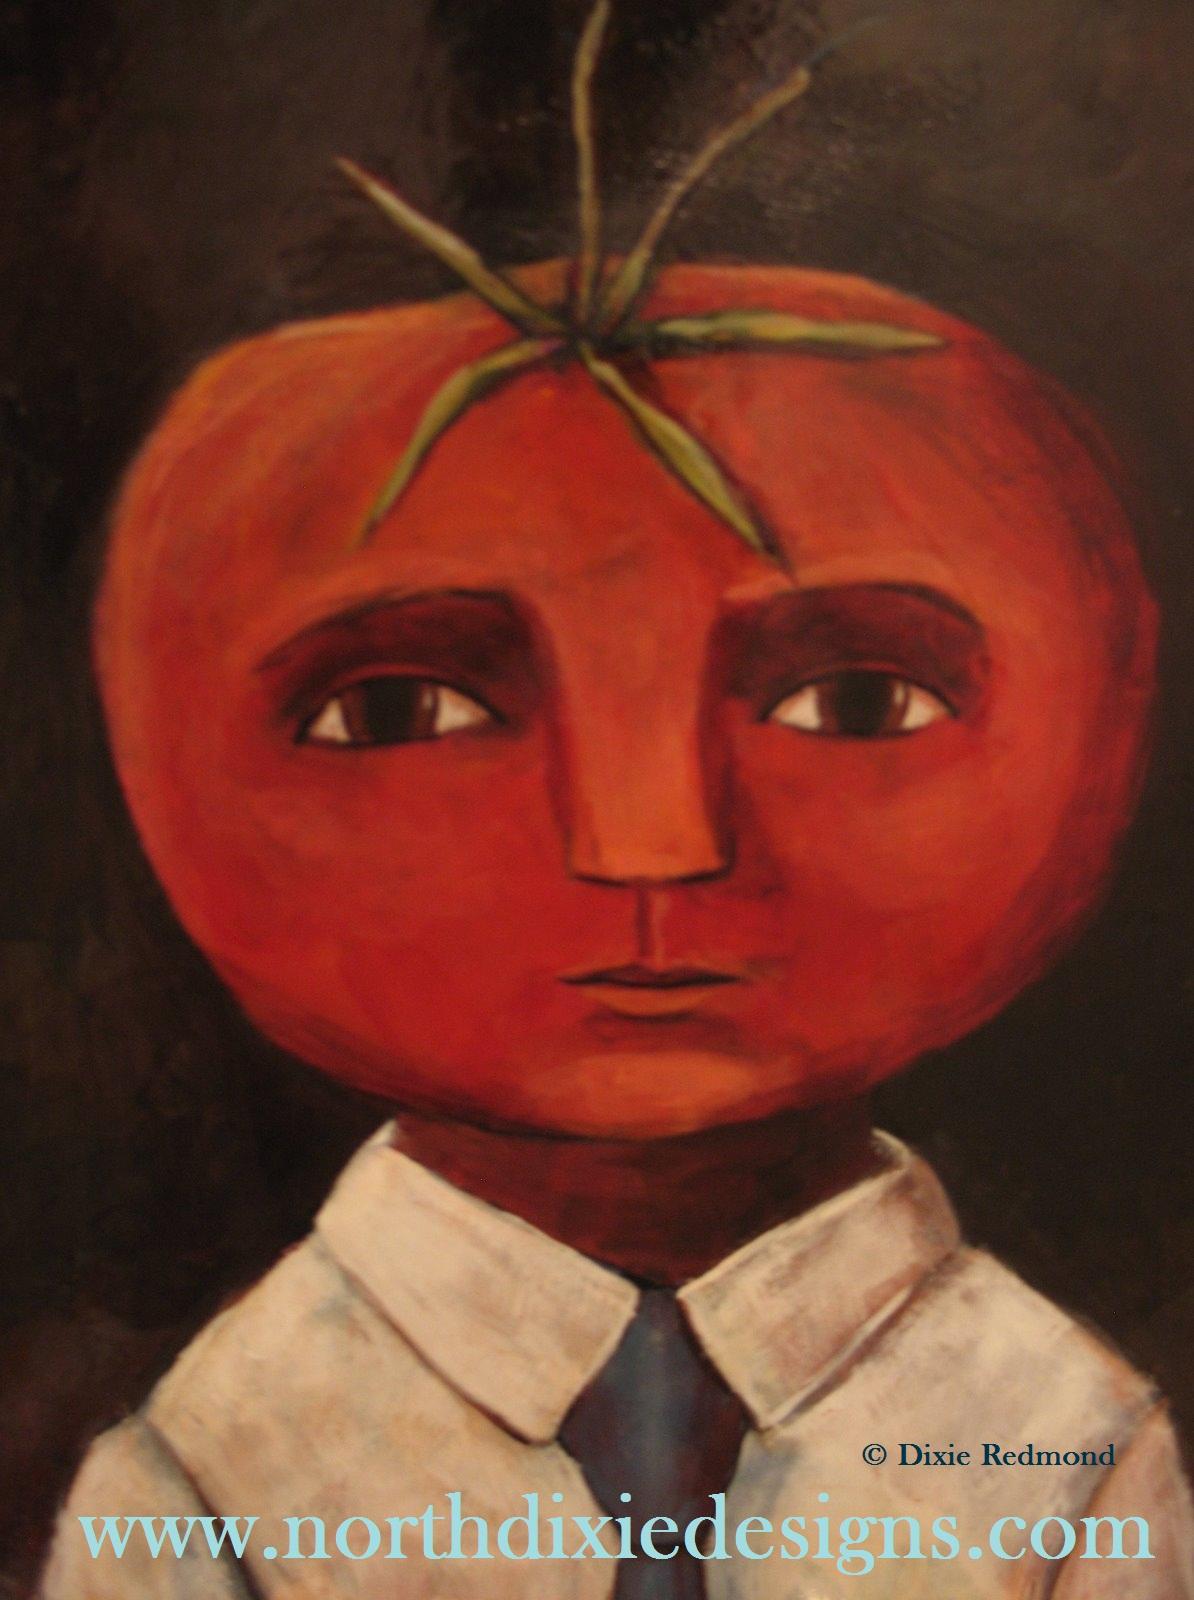 Northdixie Designs Tomato Boy II Listed On Ebay